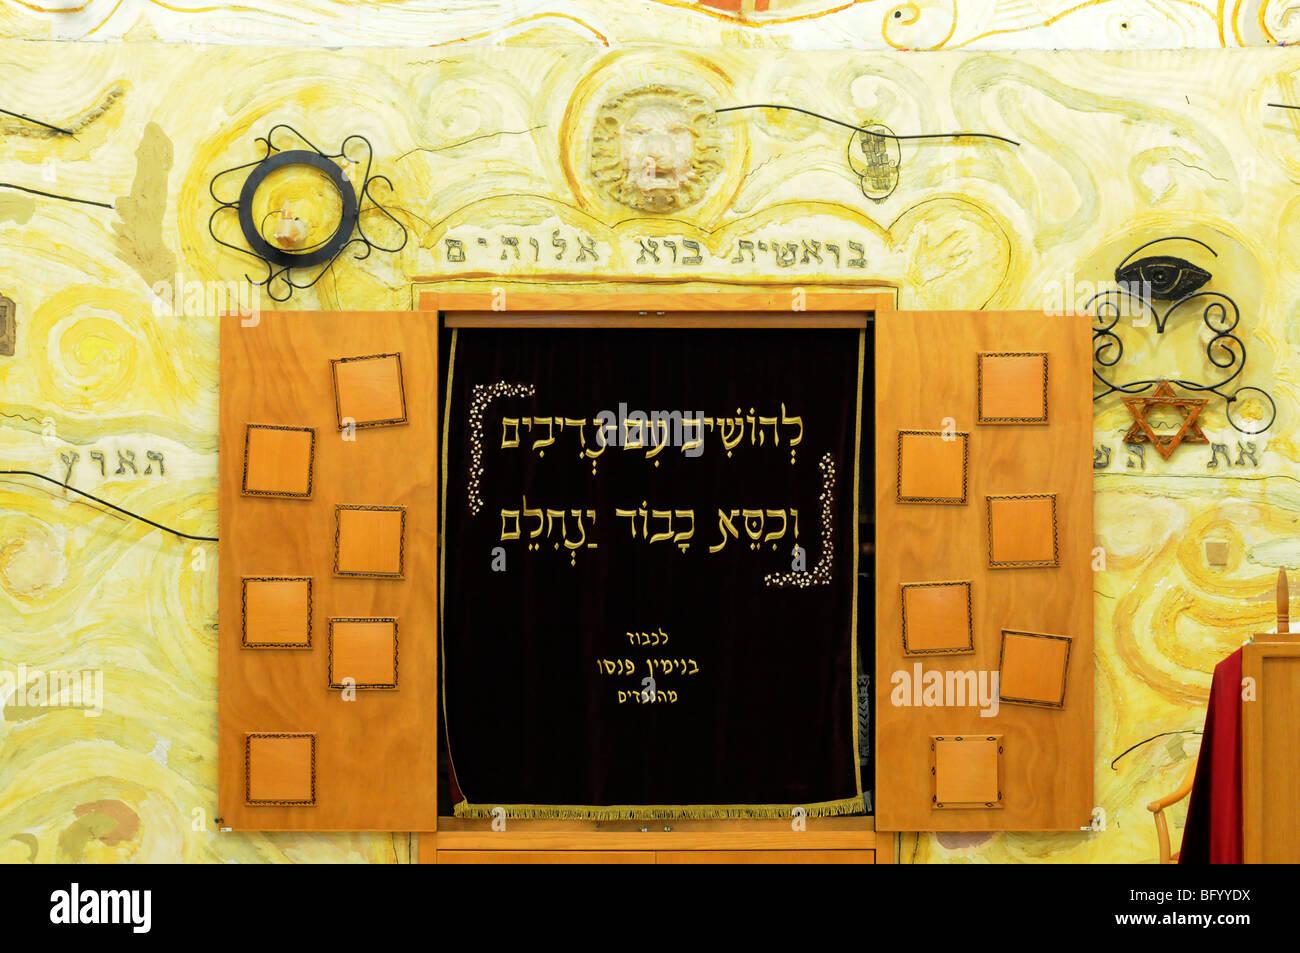 Israel, Tel Aviv, Beit Daniel, Tel Aviv's first Reform Synagogue. The Ark containing the Torah scrolls - Stock Image